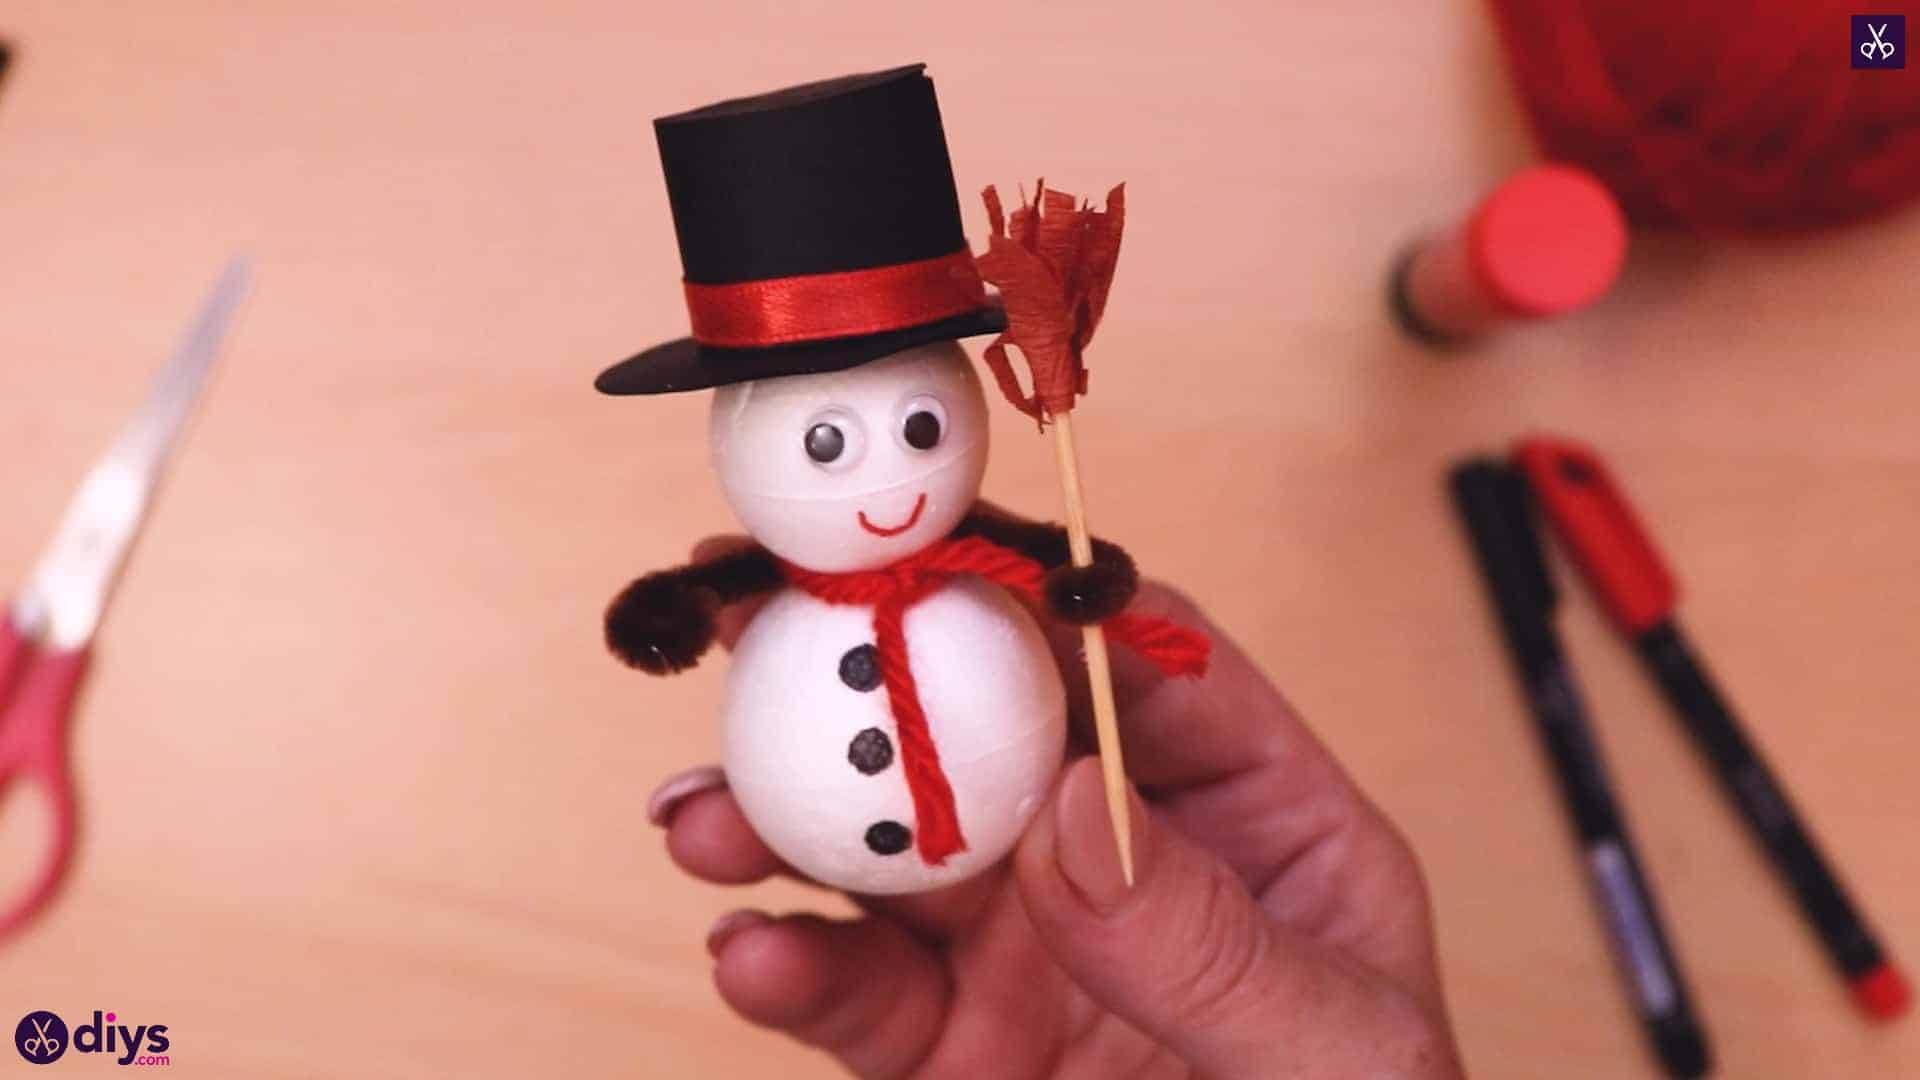 Diy styrofoam snowman